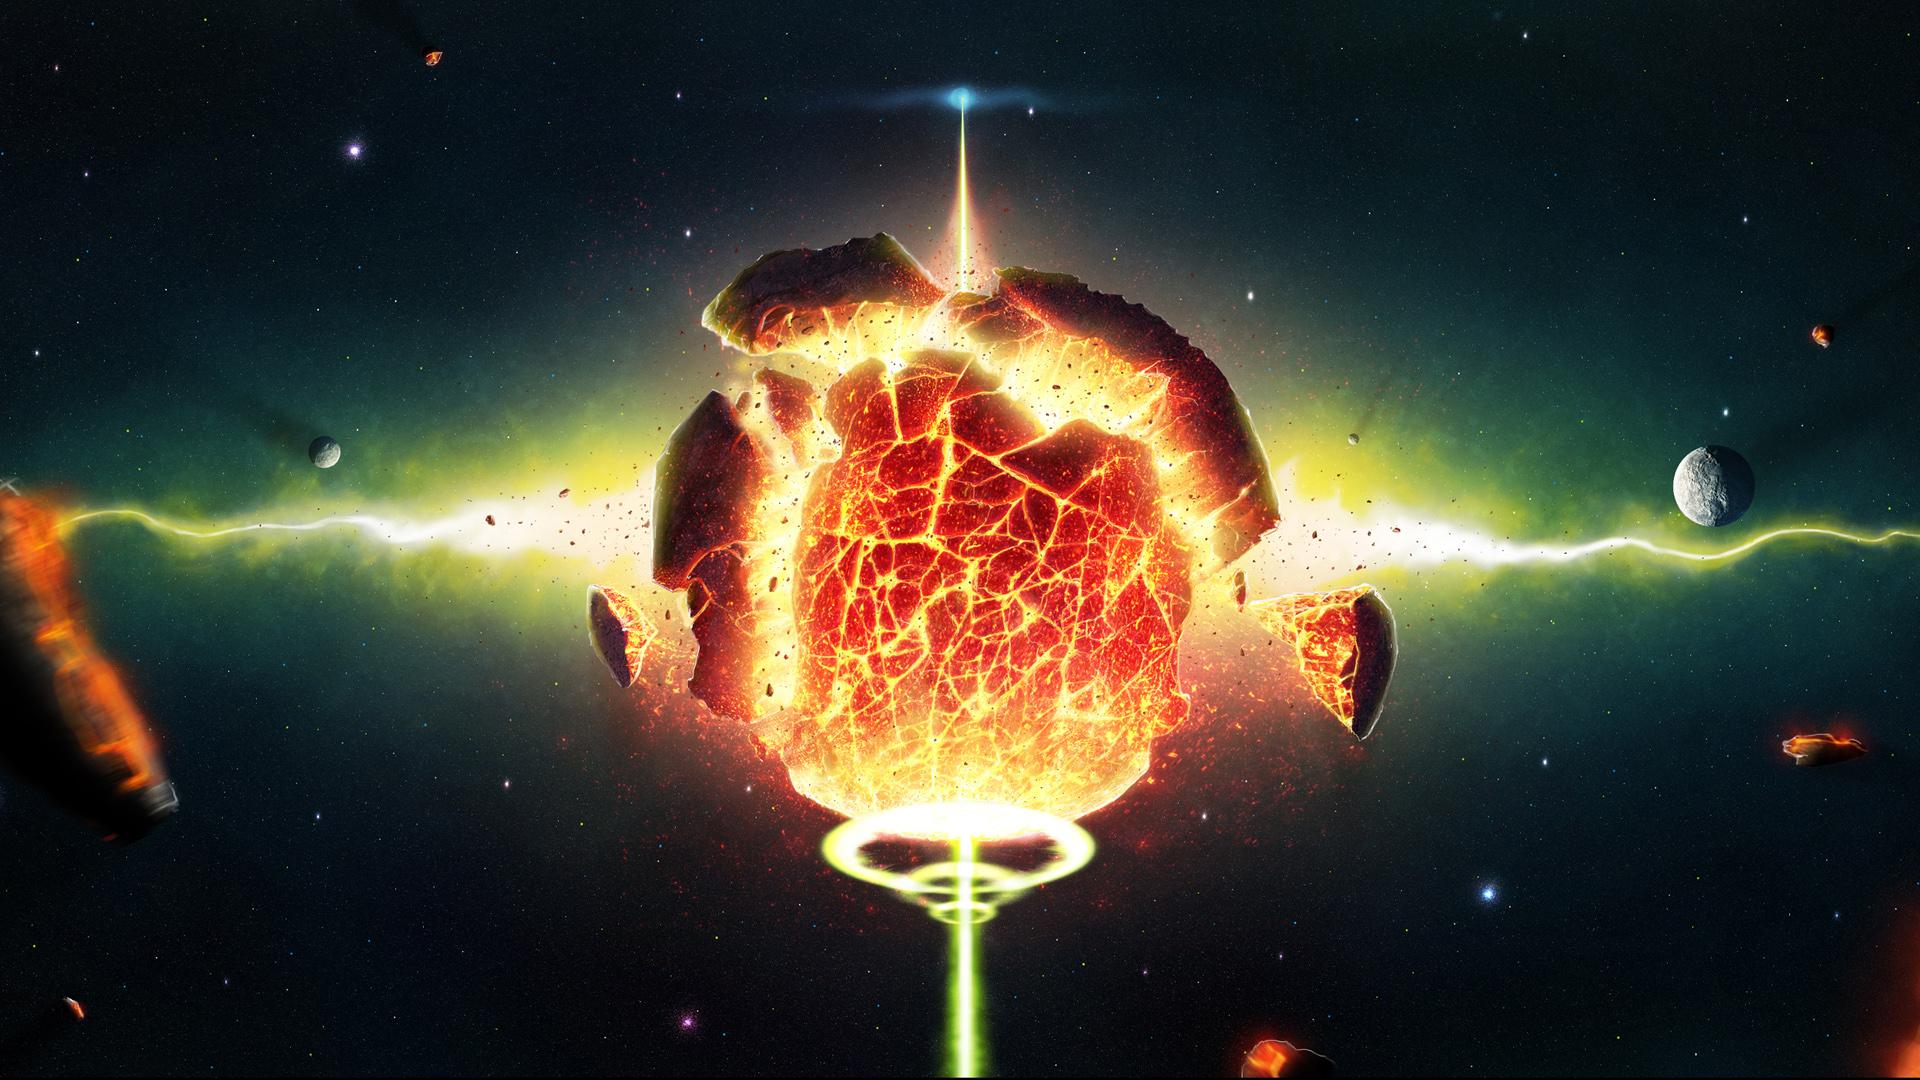 HD Wallpaper   Background ID:361783. 1920x1080 Sci Fi Explosion